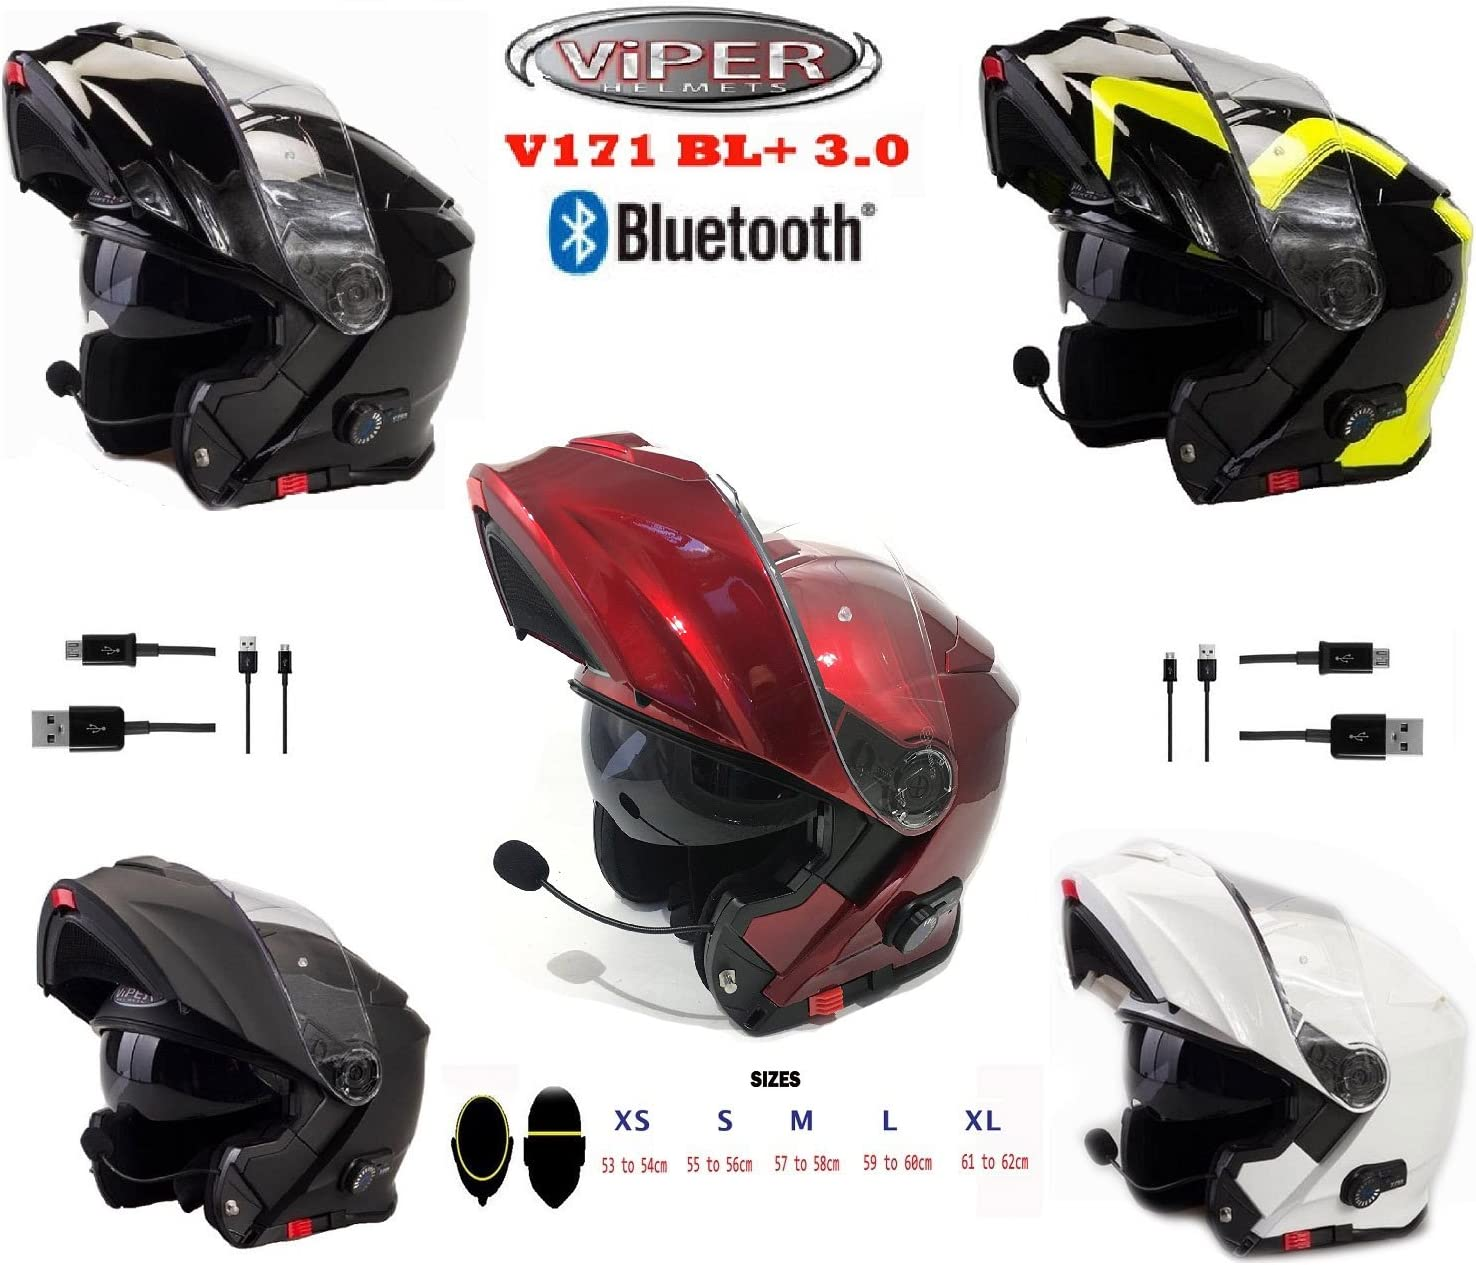 Viper V171 BL Bluetooth Flip up Touring Casco Ribaltabile Bluetooth Casco Moto 3.0 Casco modulare da Moto